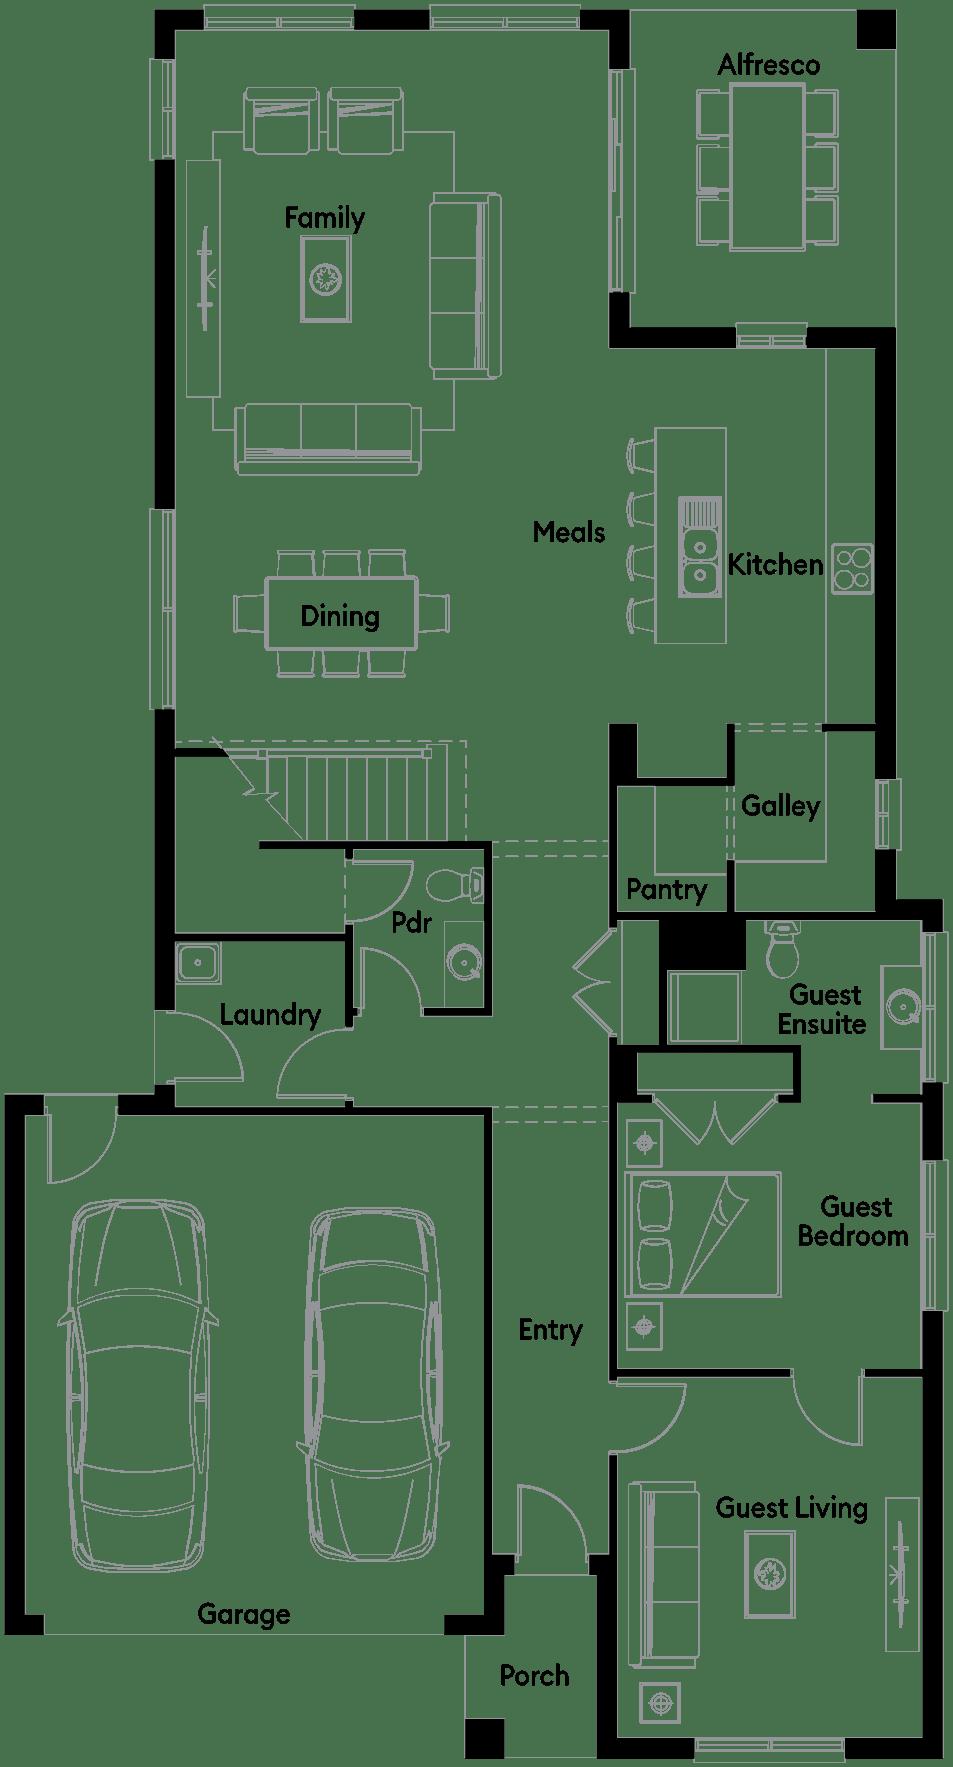 FloorPlan1_HOUSE769_Stanhope_41-01-5